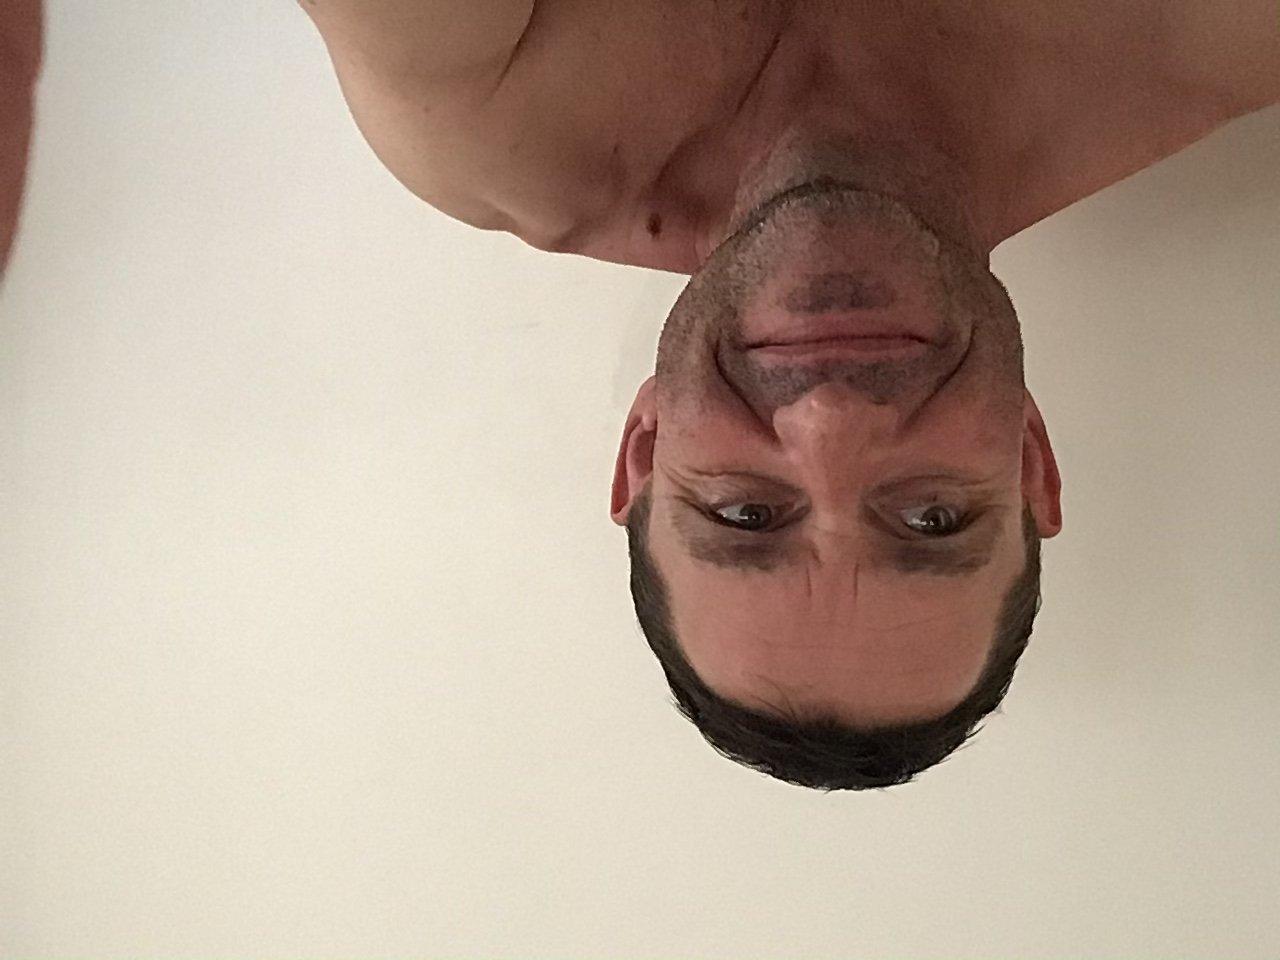 Scott from Queensland,Australia